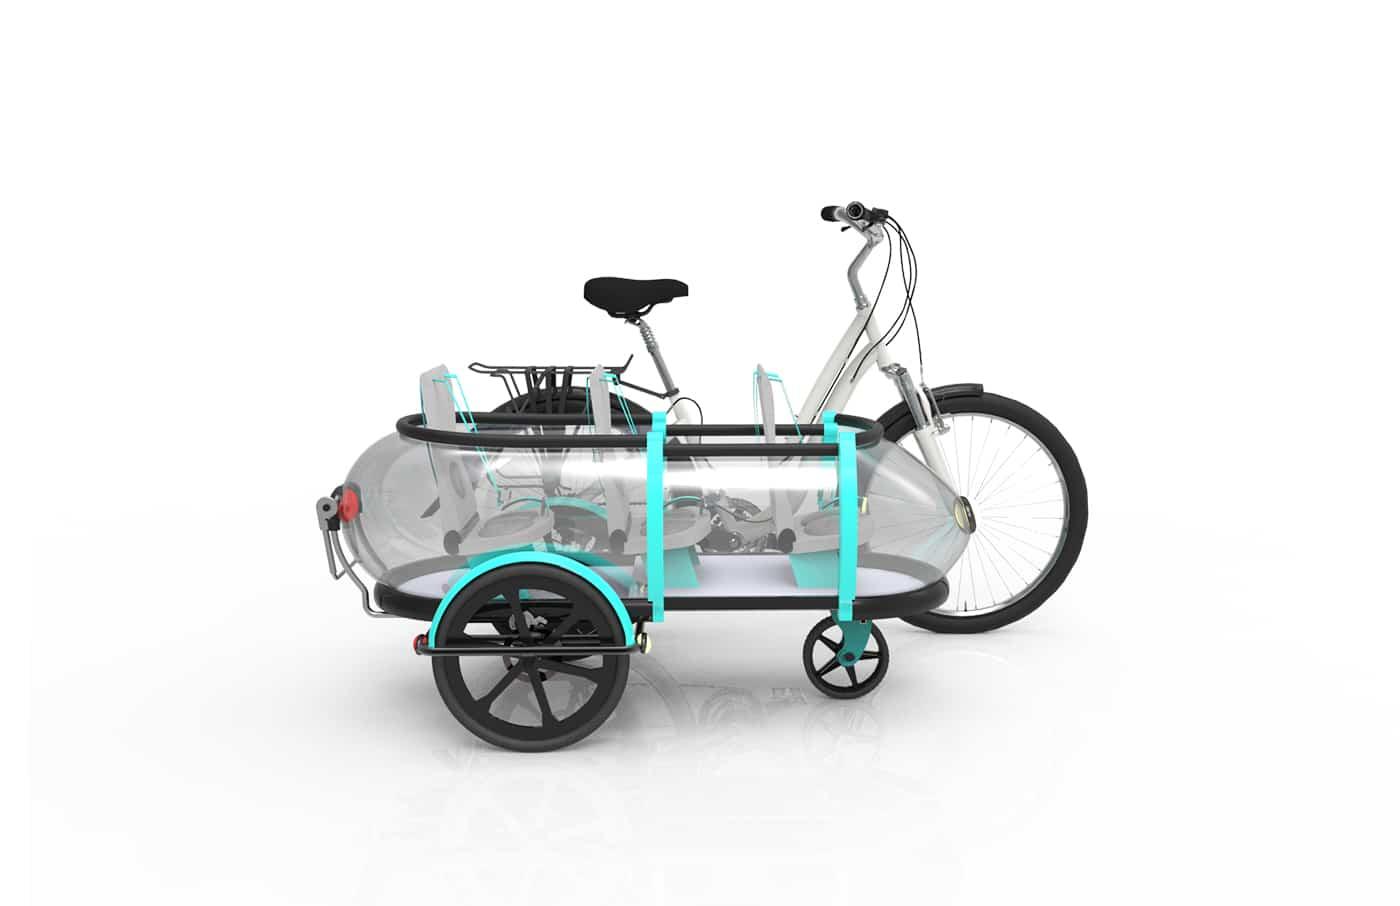 SideBuddy-by-Jordi-Hans-Design-Bycycle-Trailer,-Cargo-Bike,-Side-Trailer,-Kid-Bike-trailer,-by-Jonkoping-Sweden-Design-Consuting-5